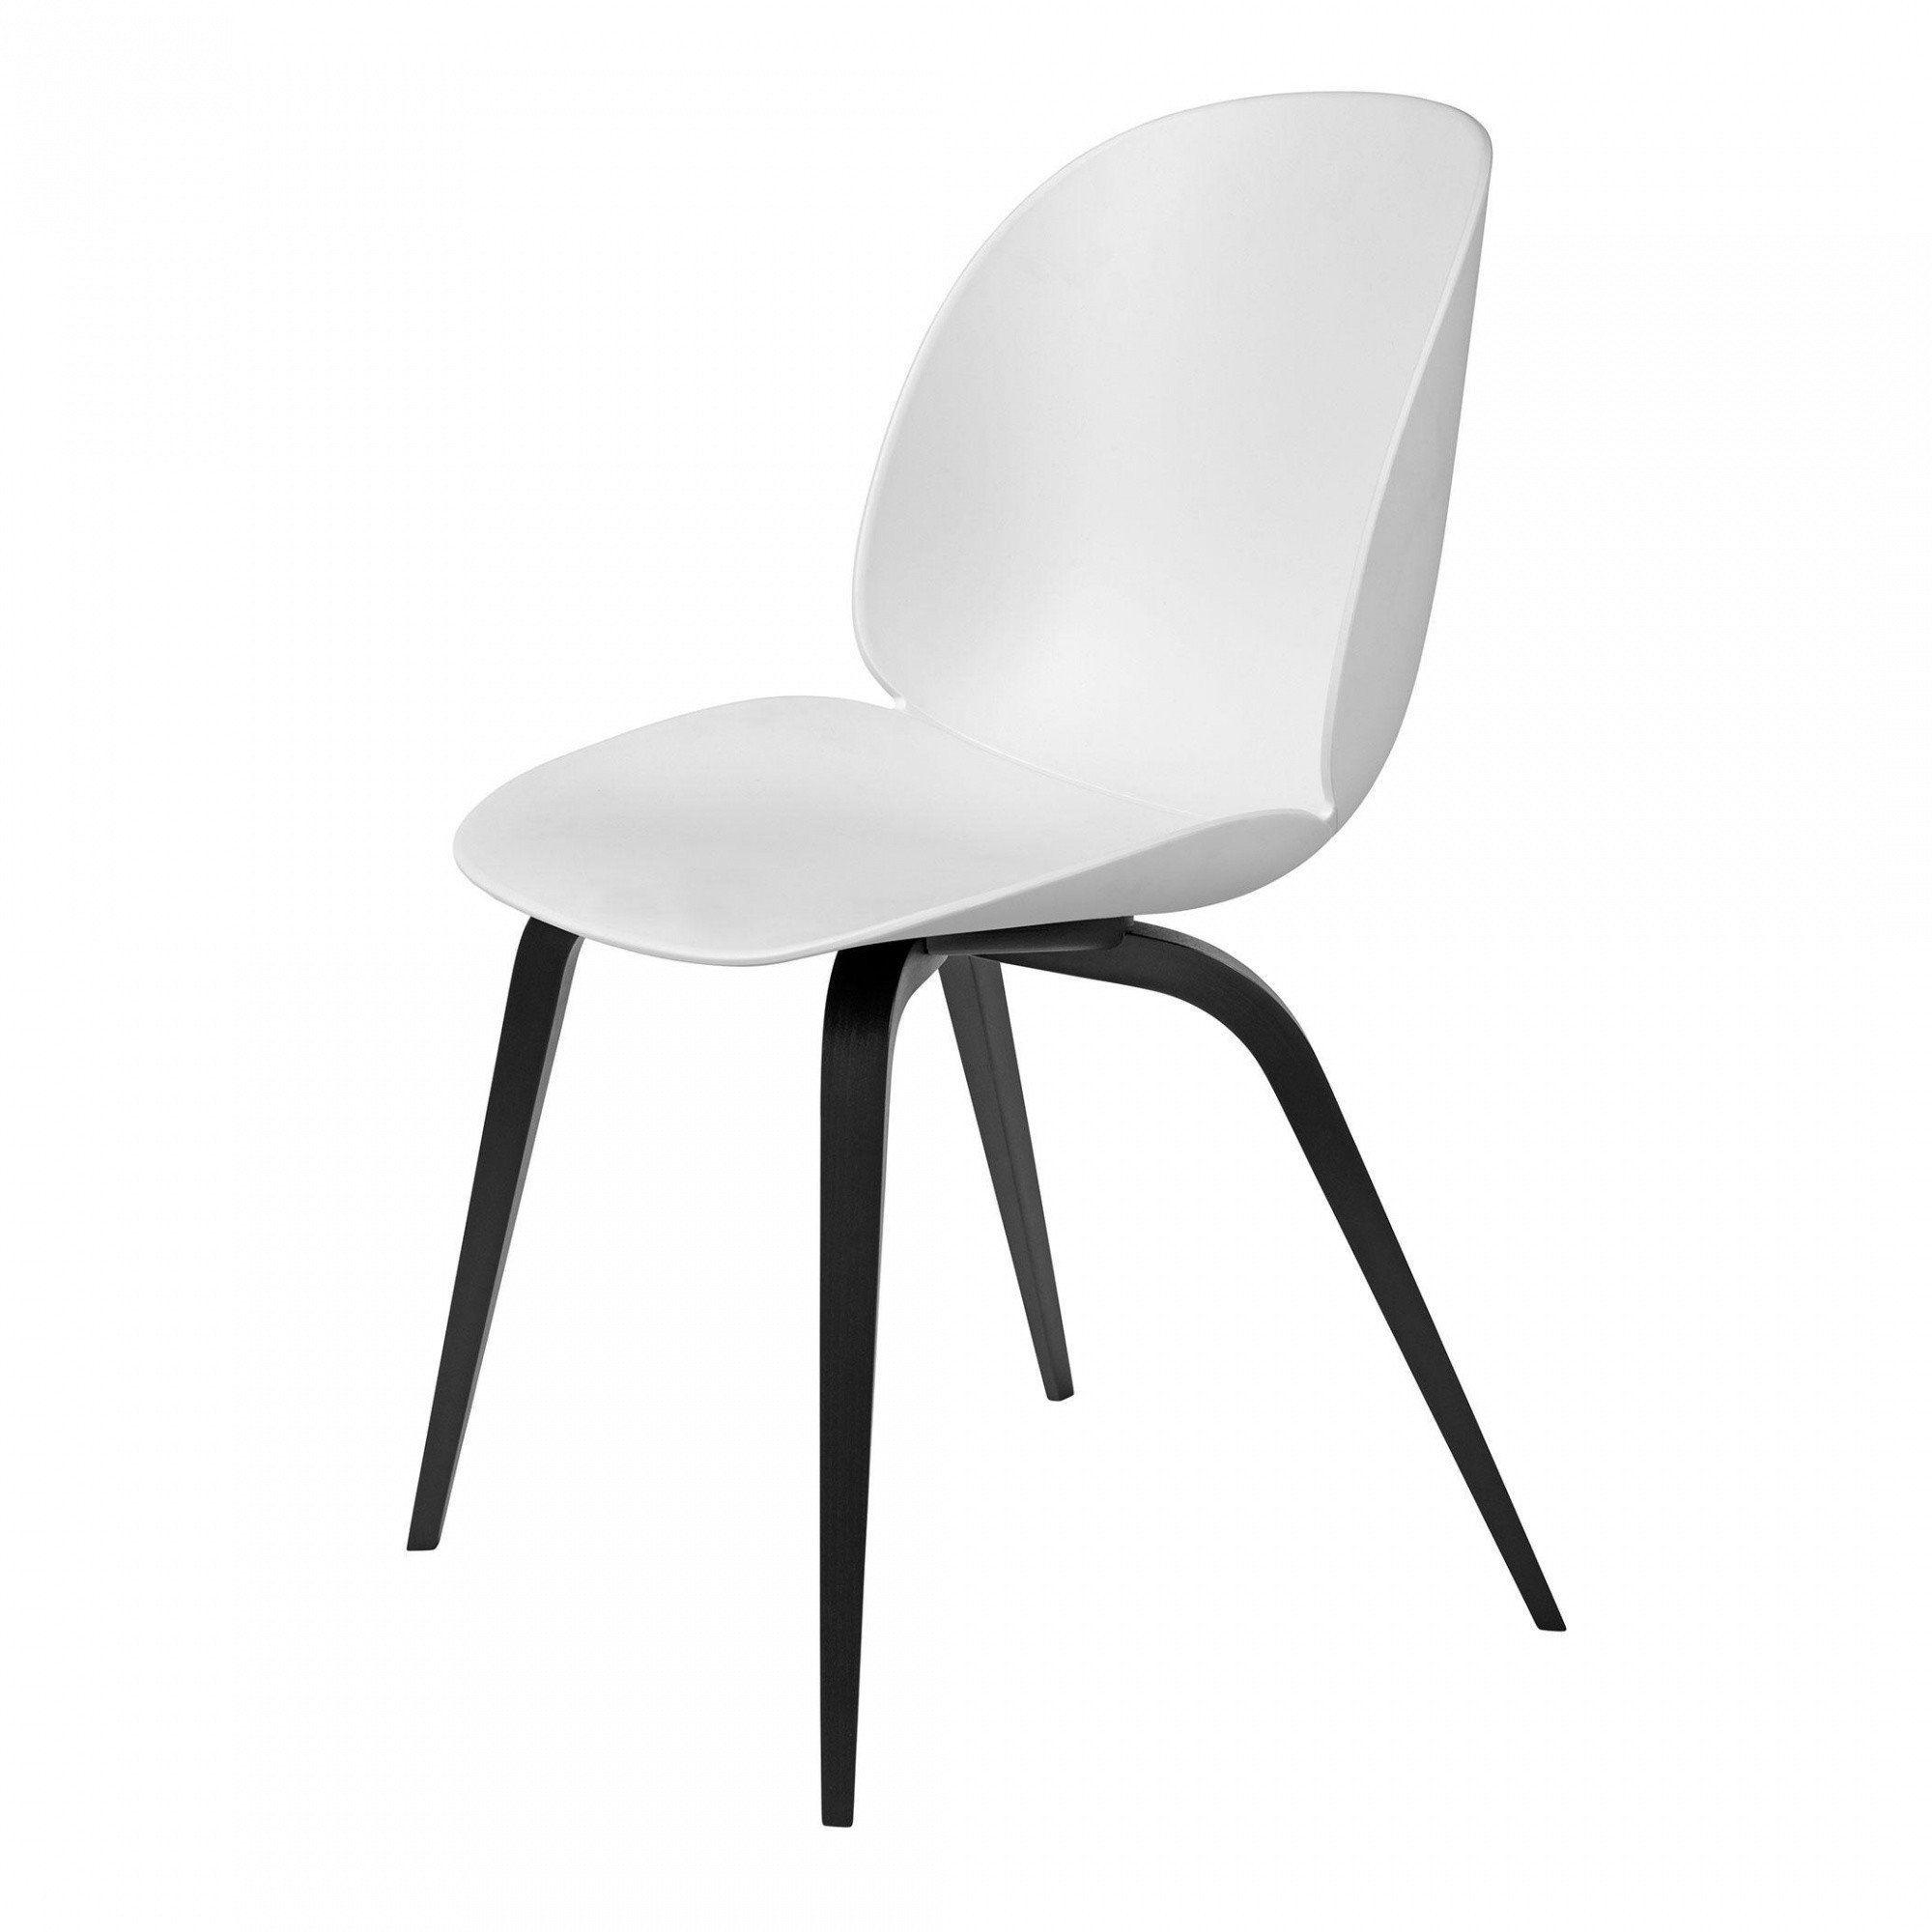 Gubi   Beetle Dining Chair With Black Beech Base   White/seat Polypropylene  ...